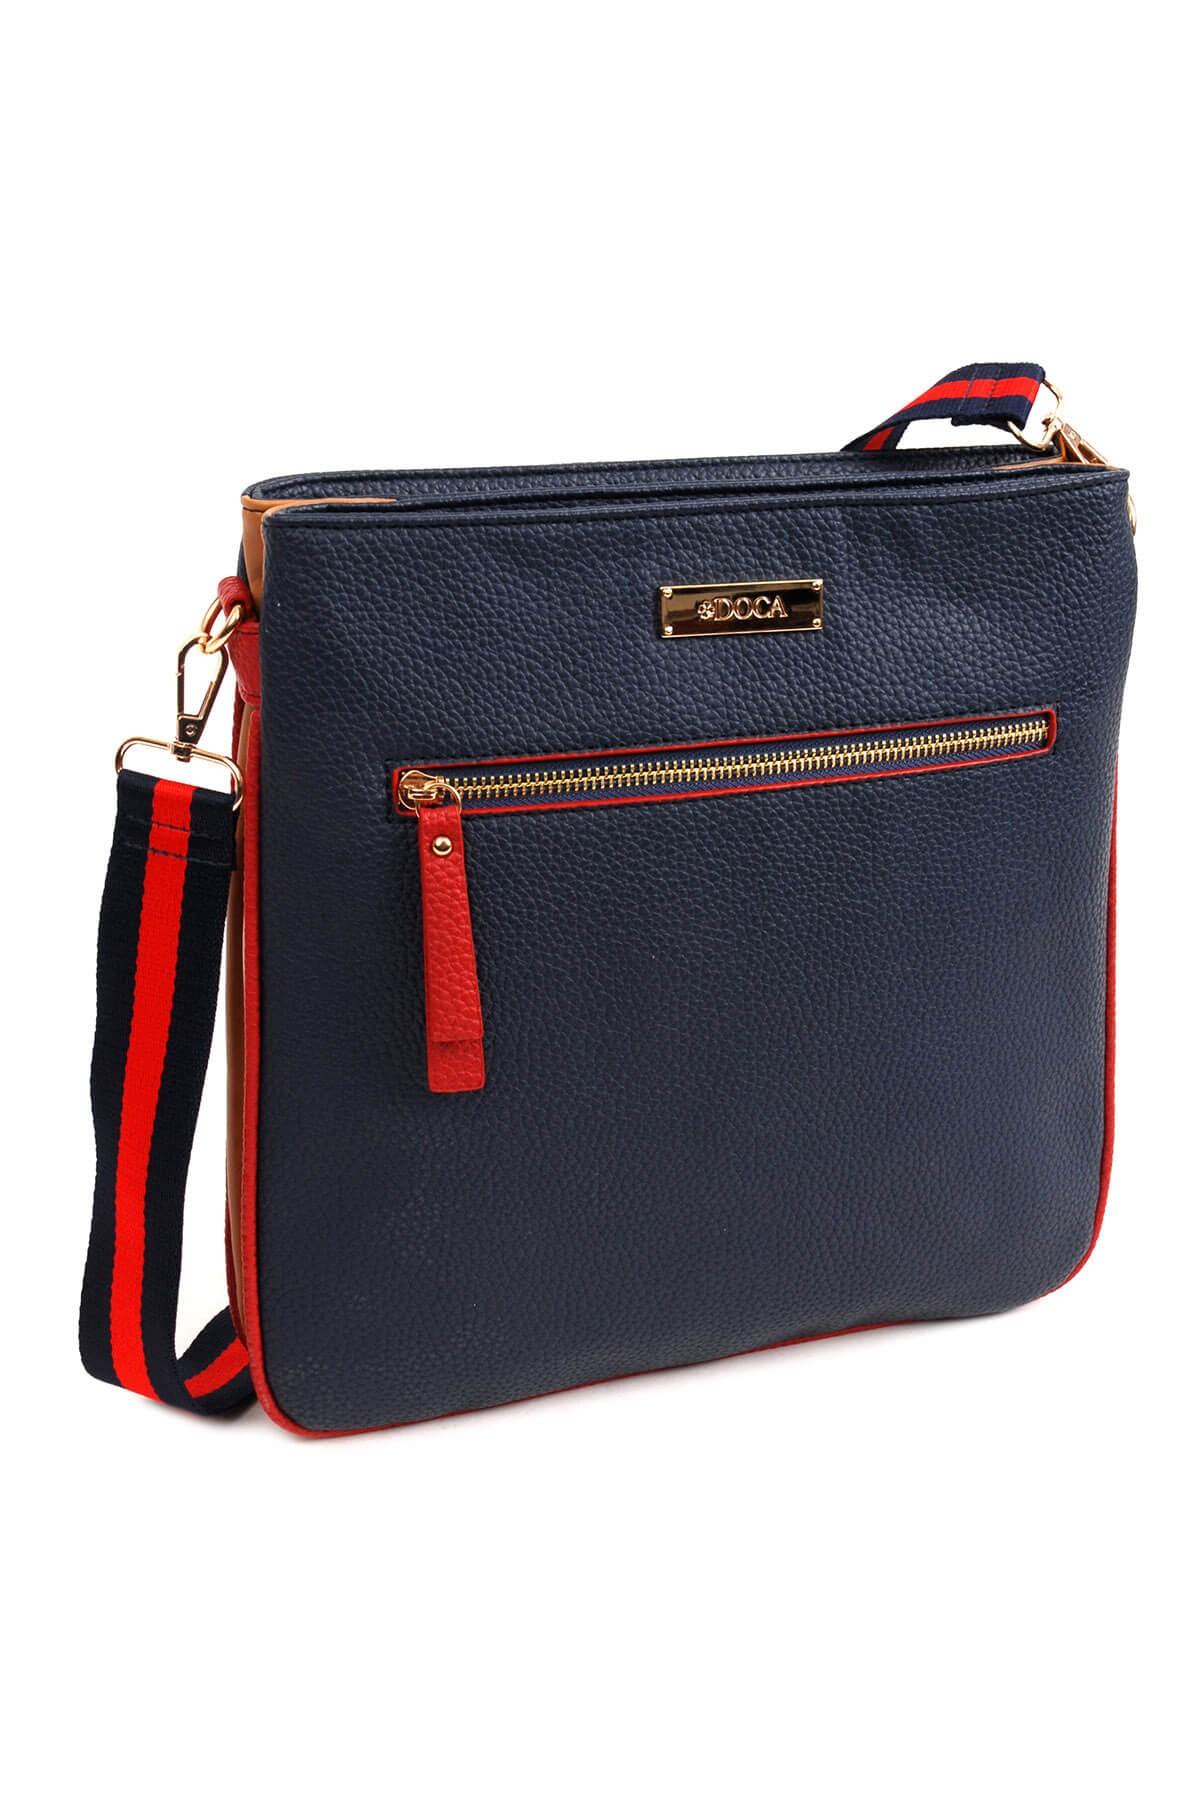 Dámská crossbody kabelka Doca 14108 - modrá 7e7b053381d